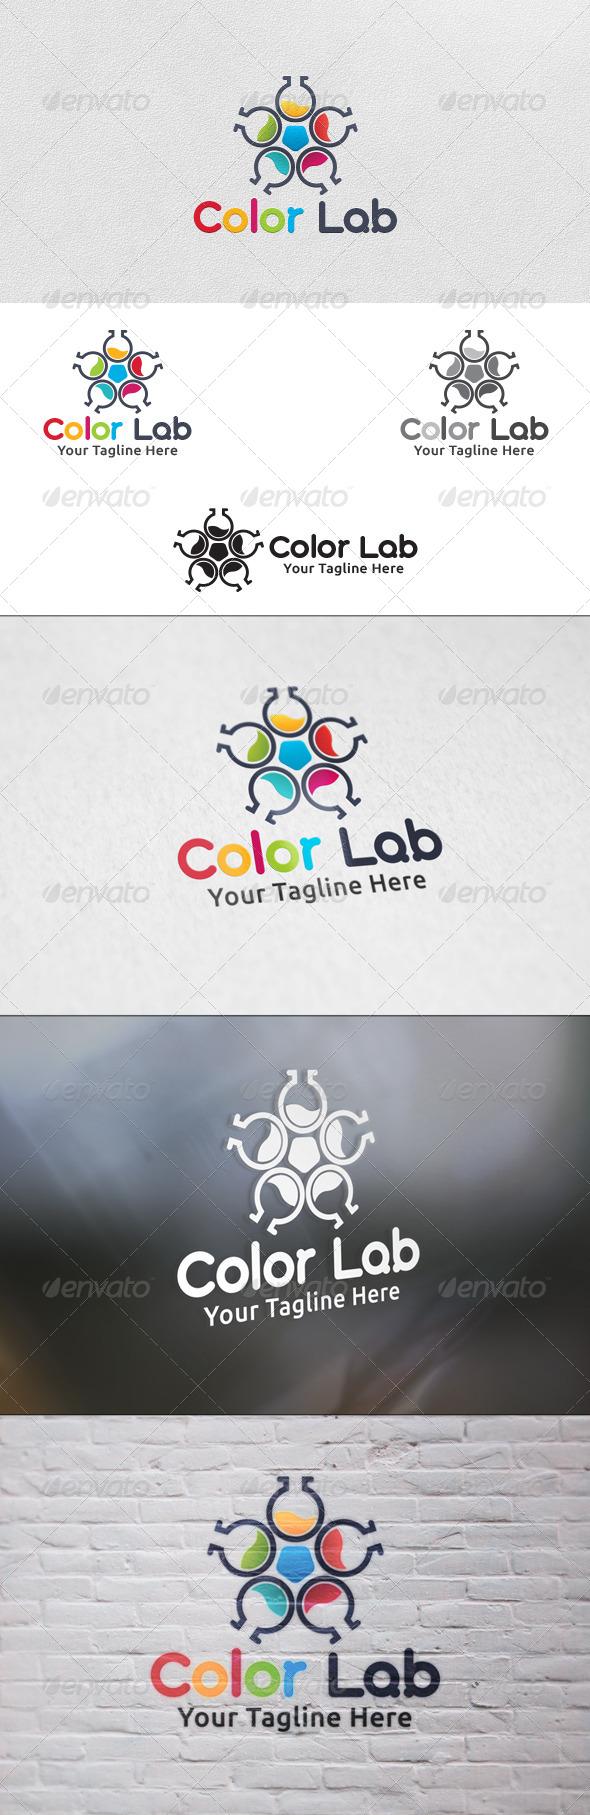 Color Lab - Logo Template by martinjamez | GraphicRiver